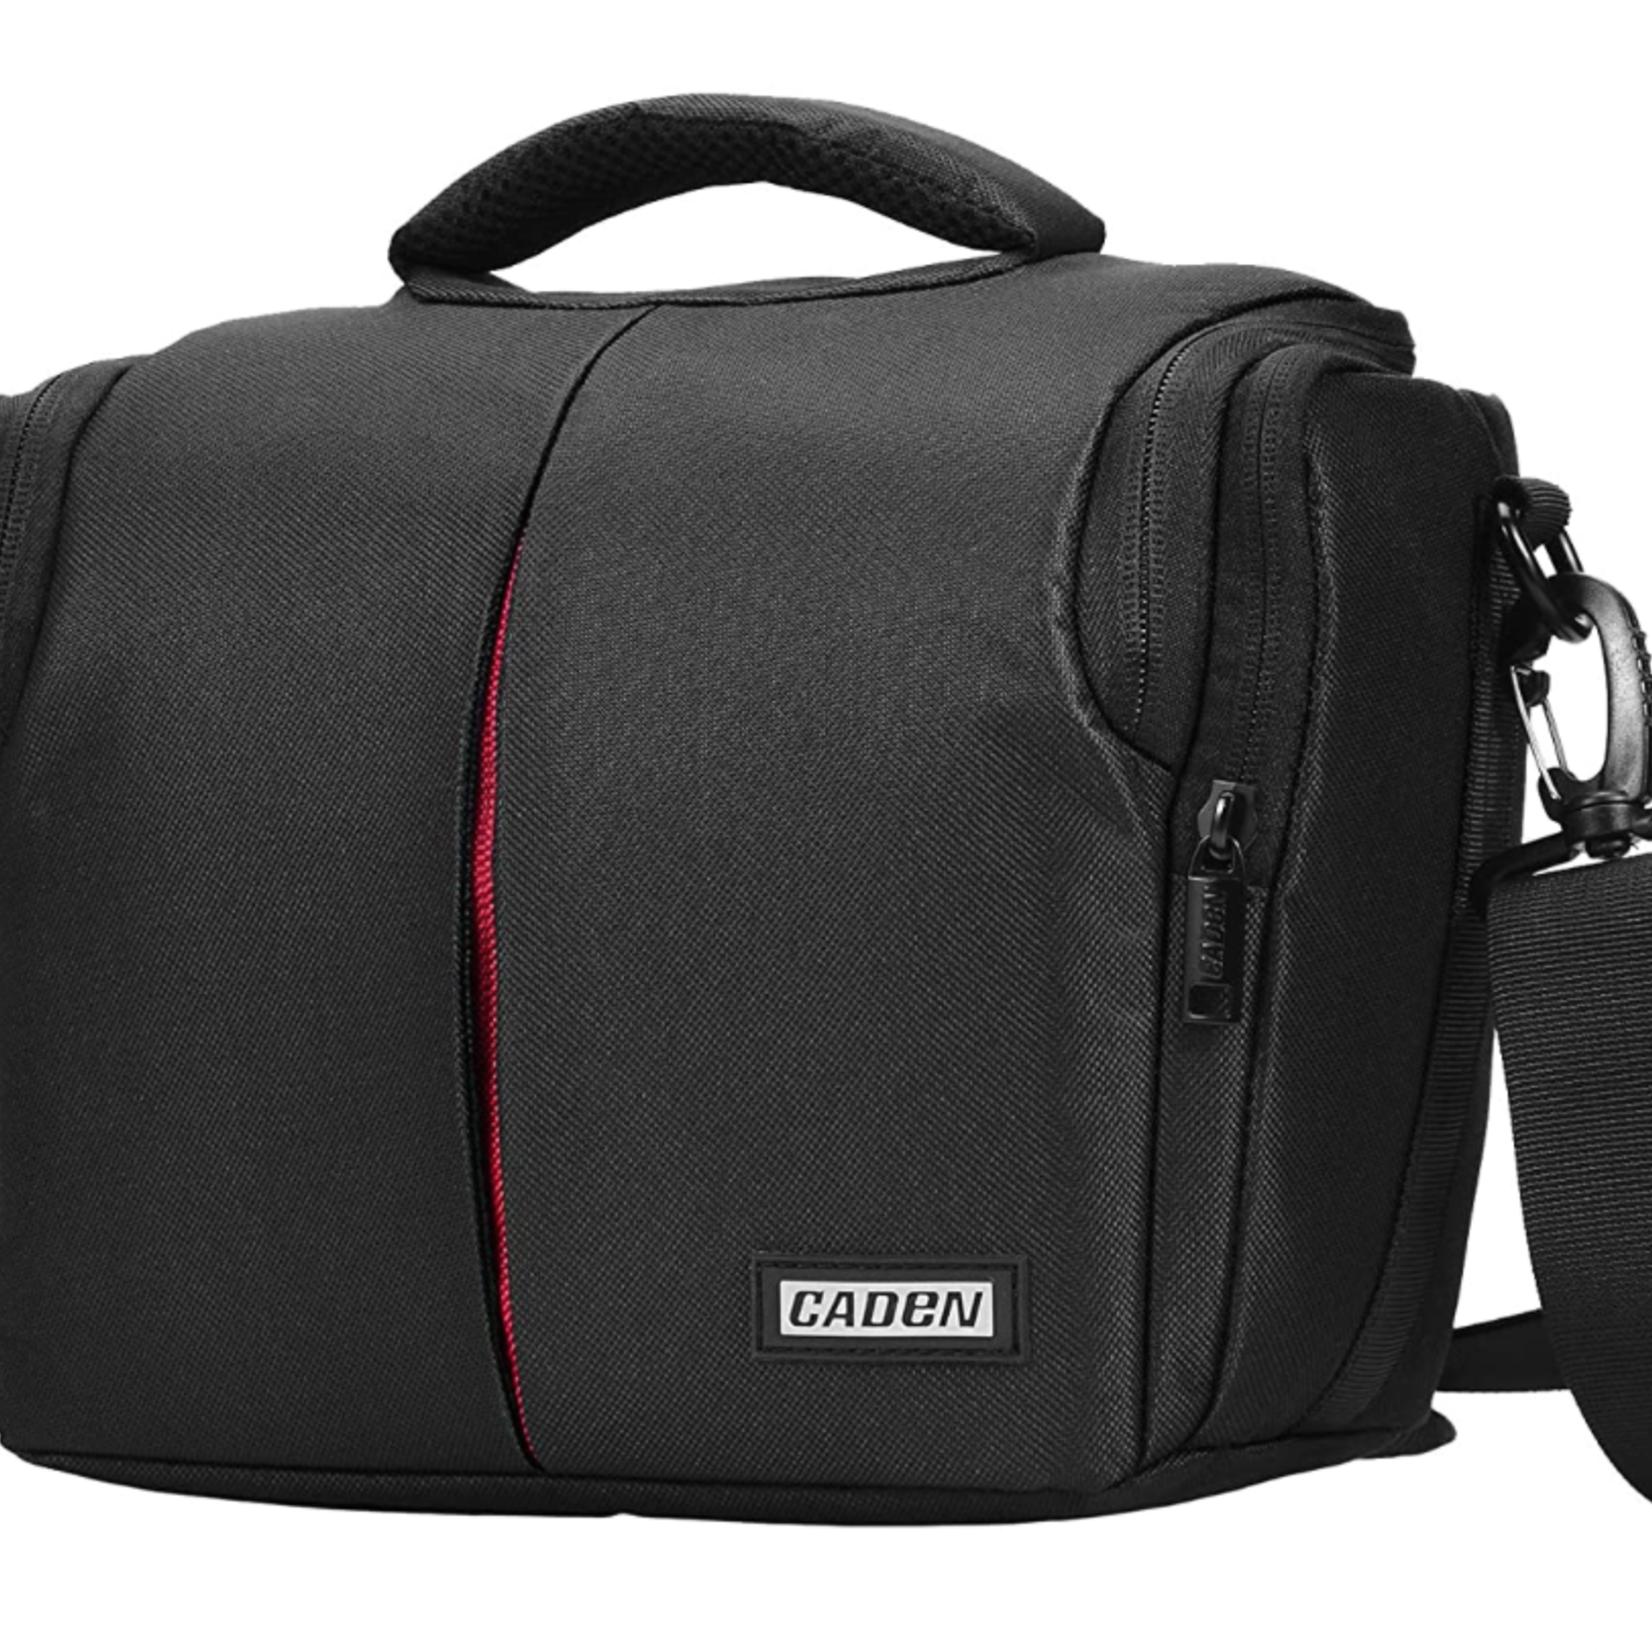 Caden Camera Bag Black